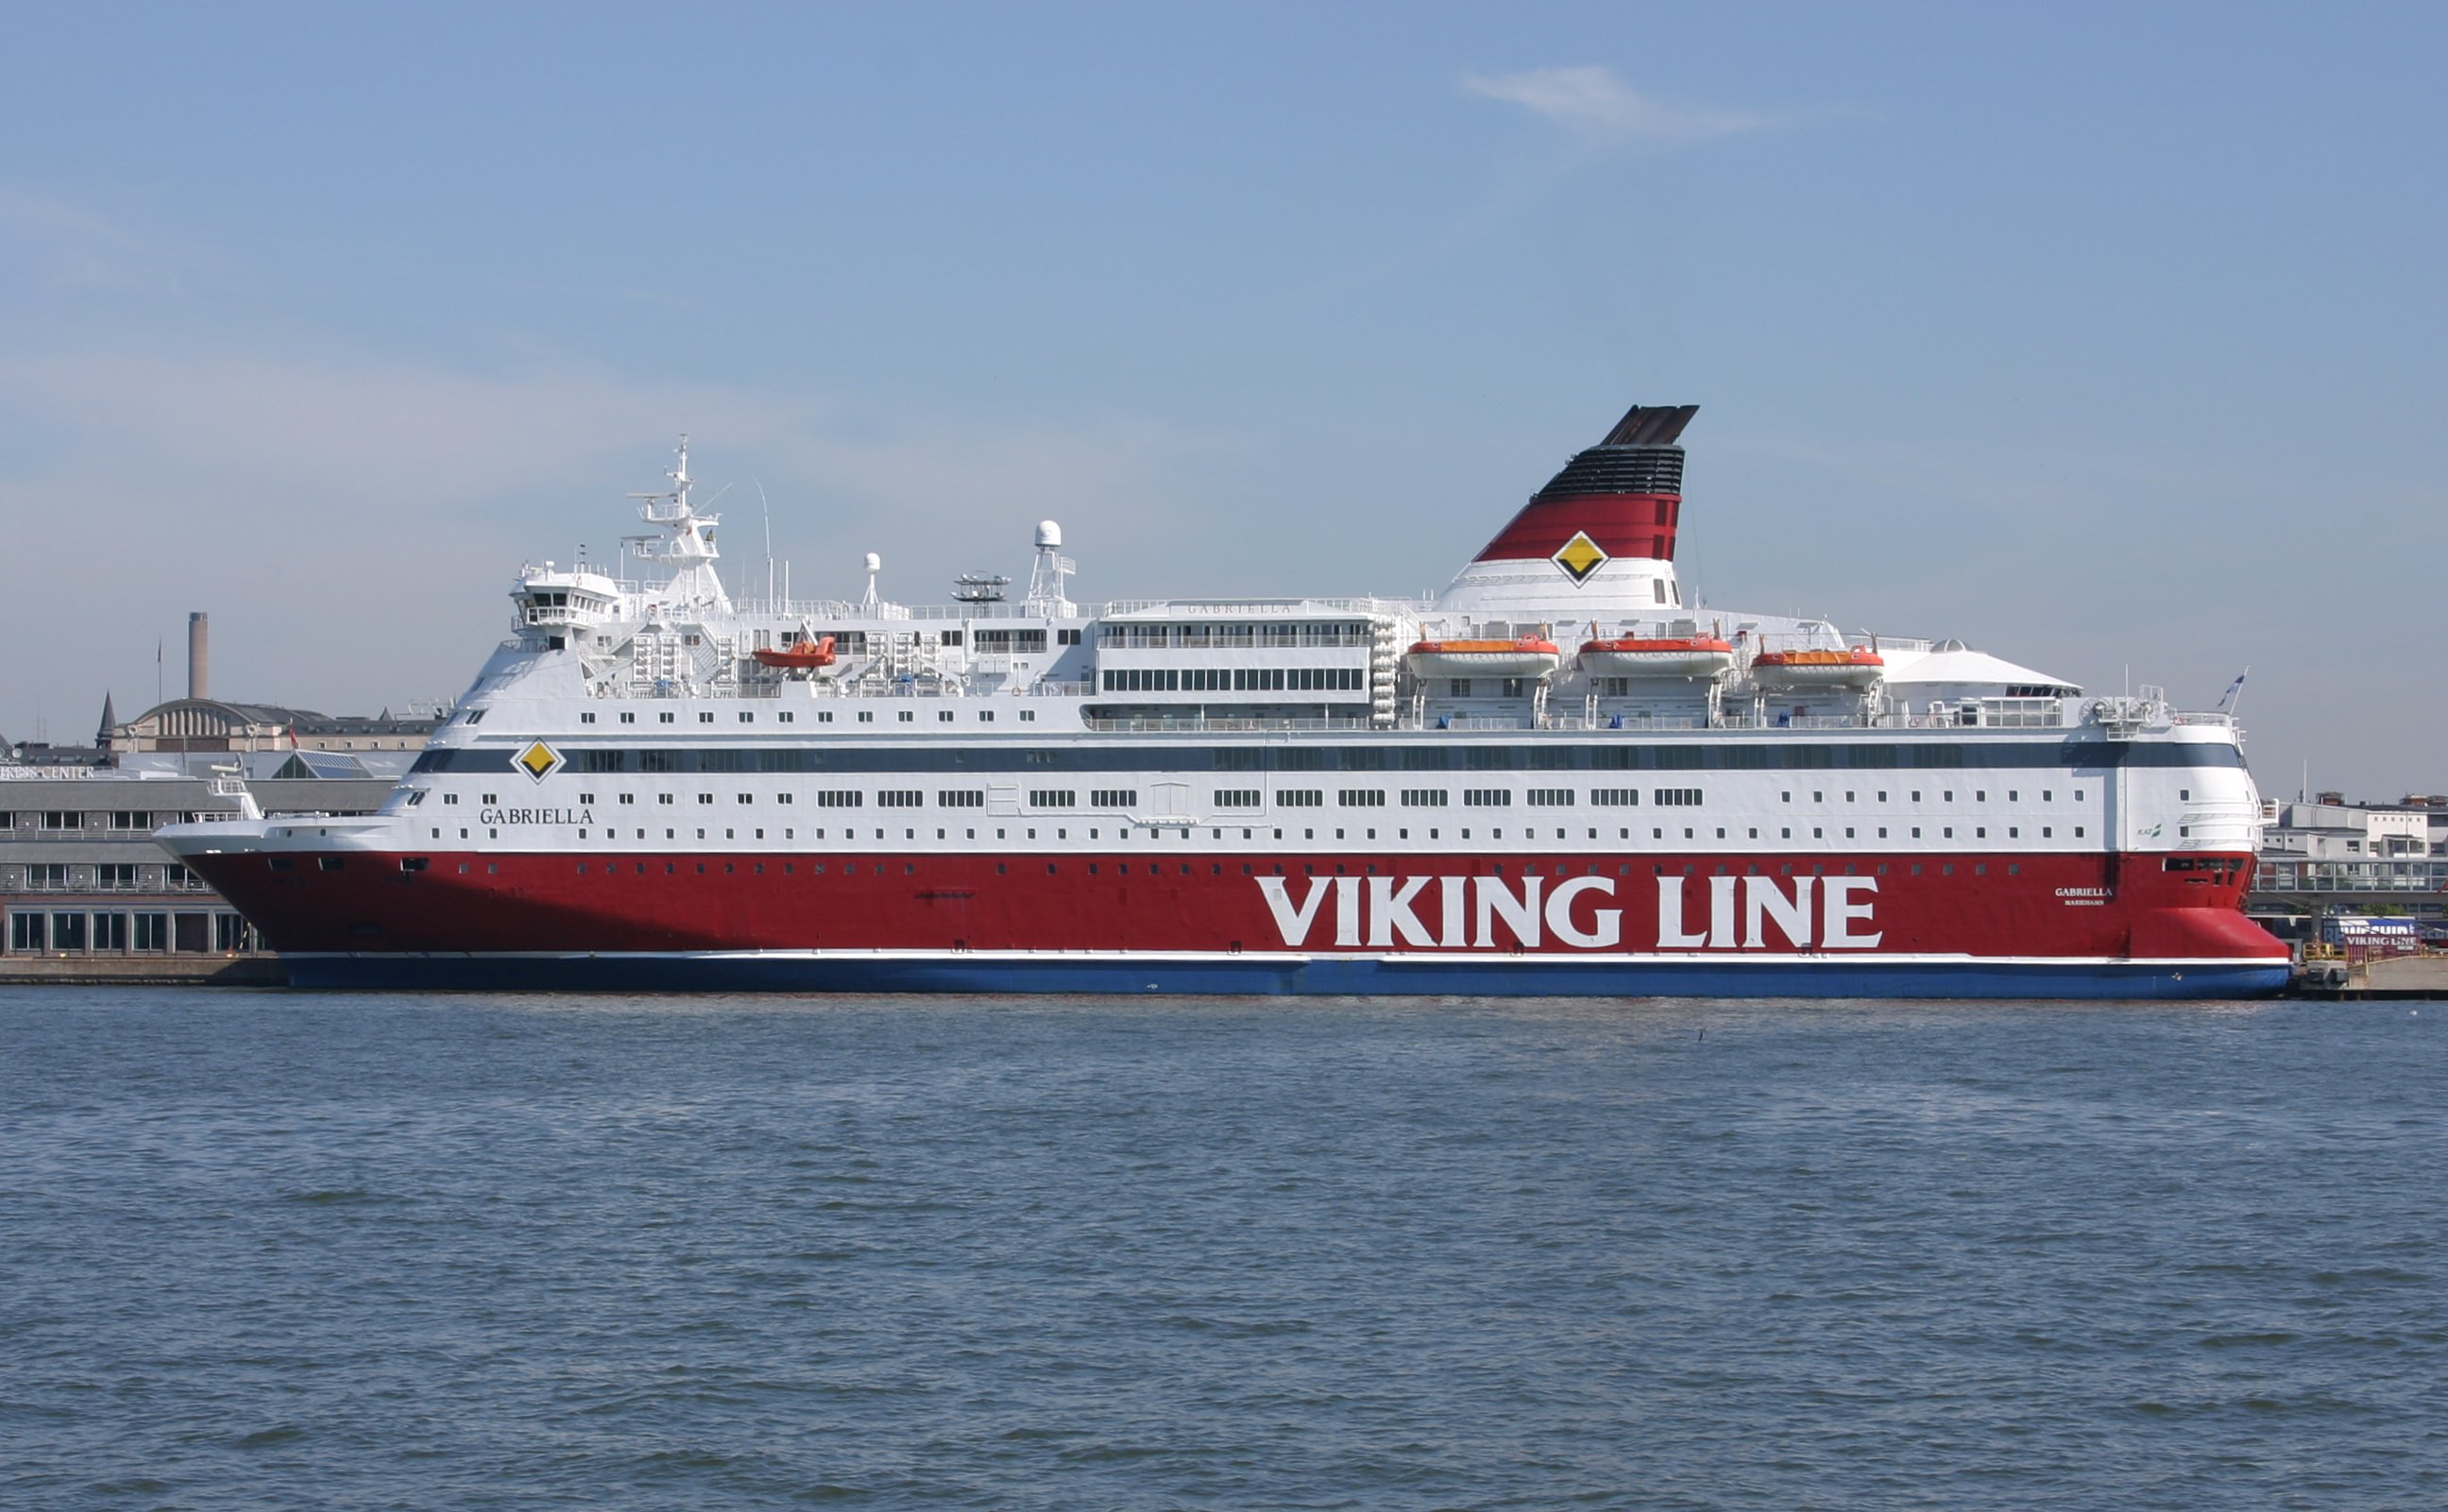 viking line helsingforskryssning